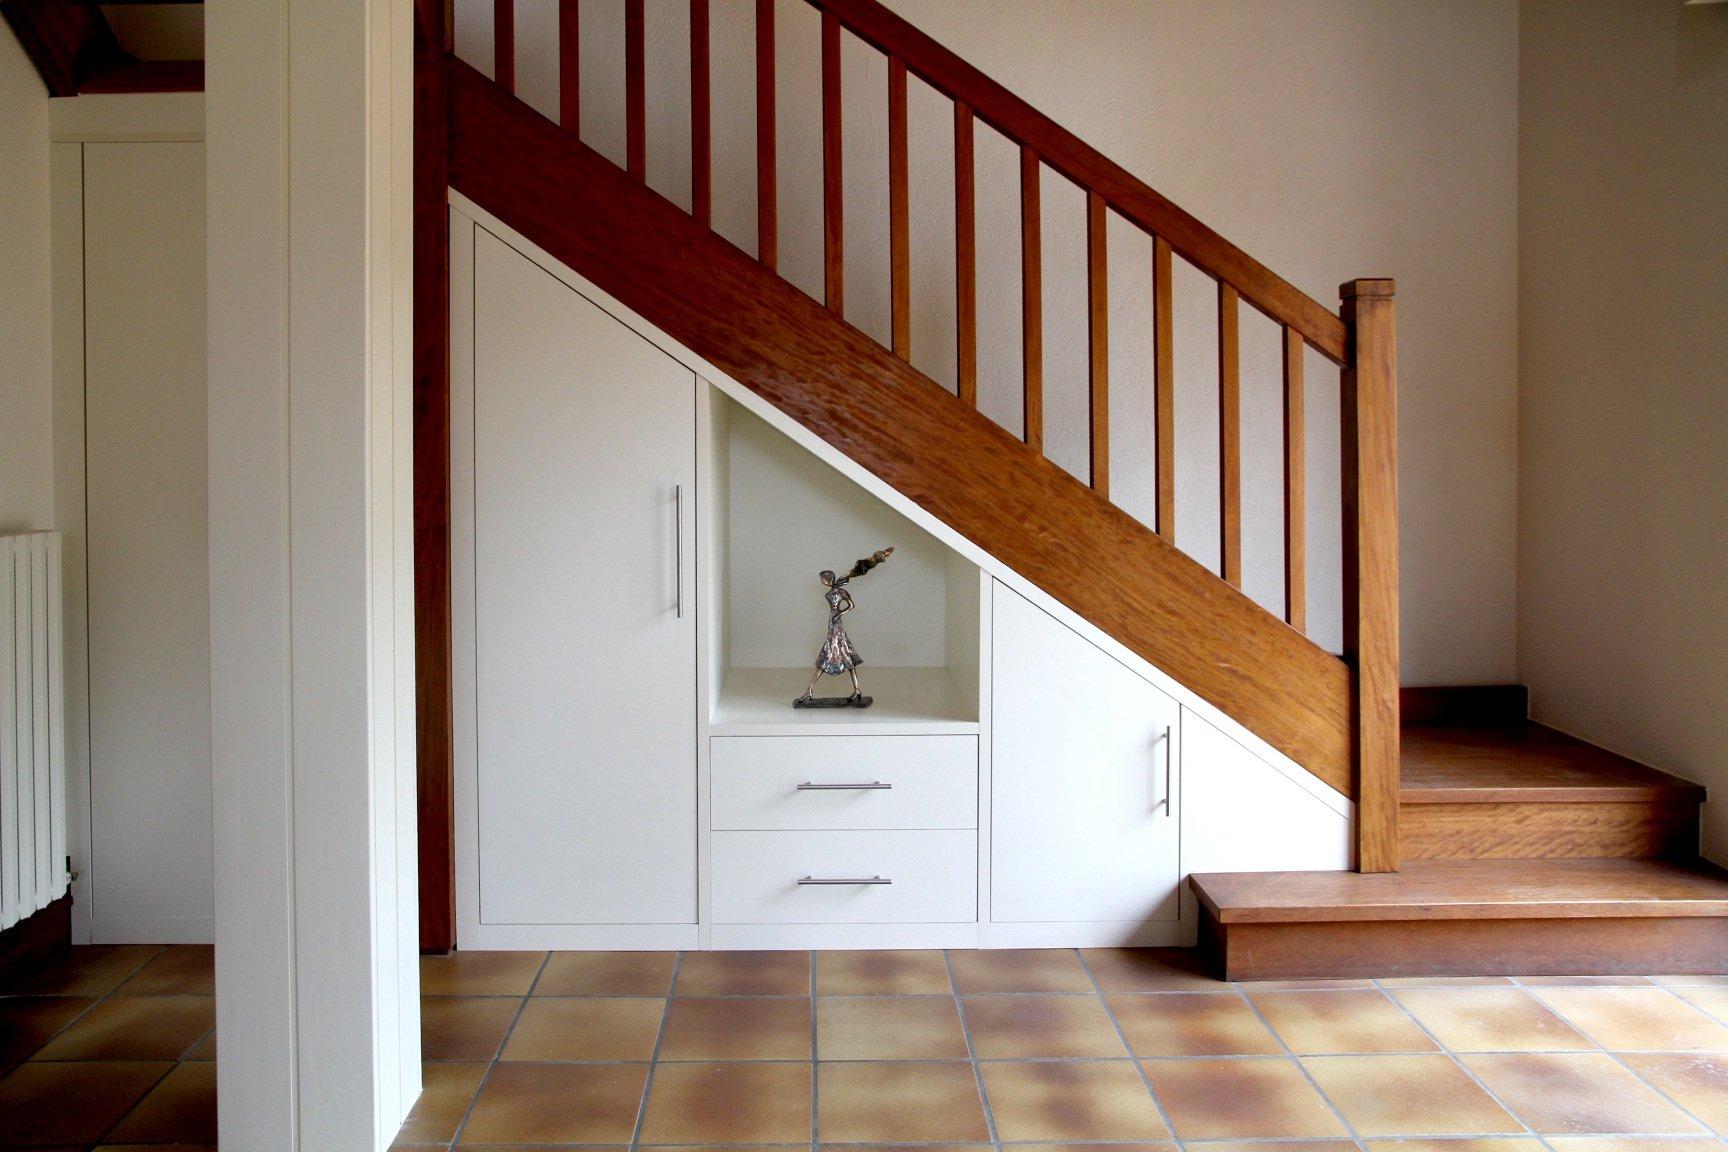 Шкаф под лестницей дизайн фото